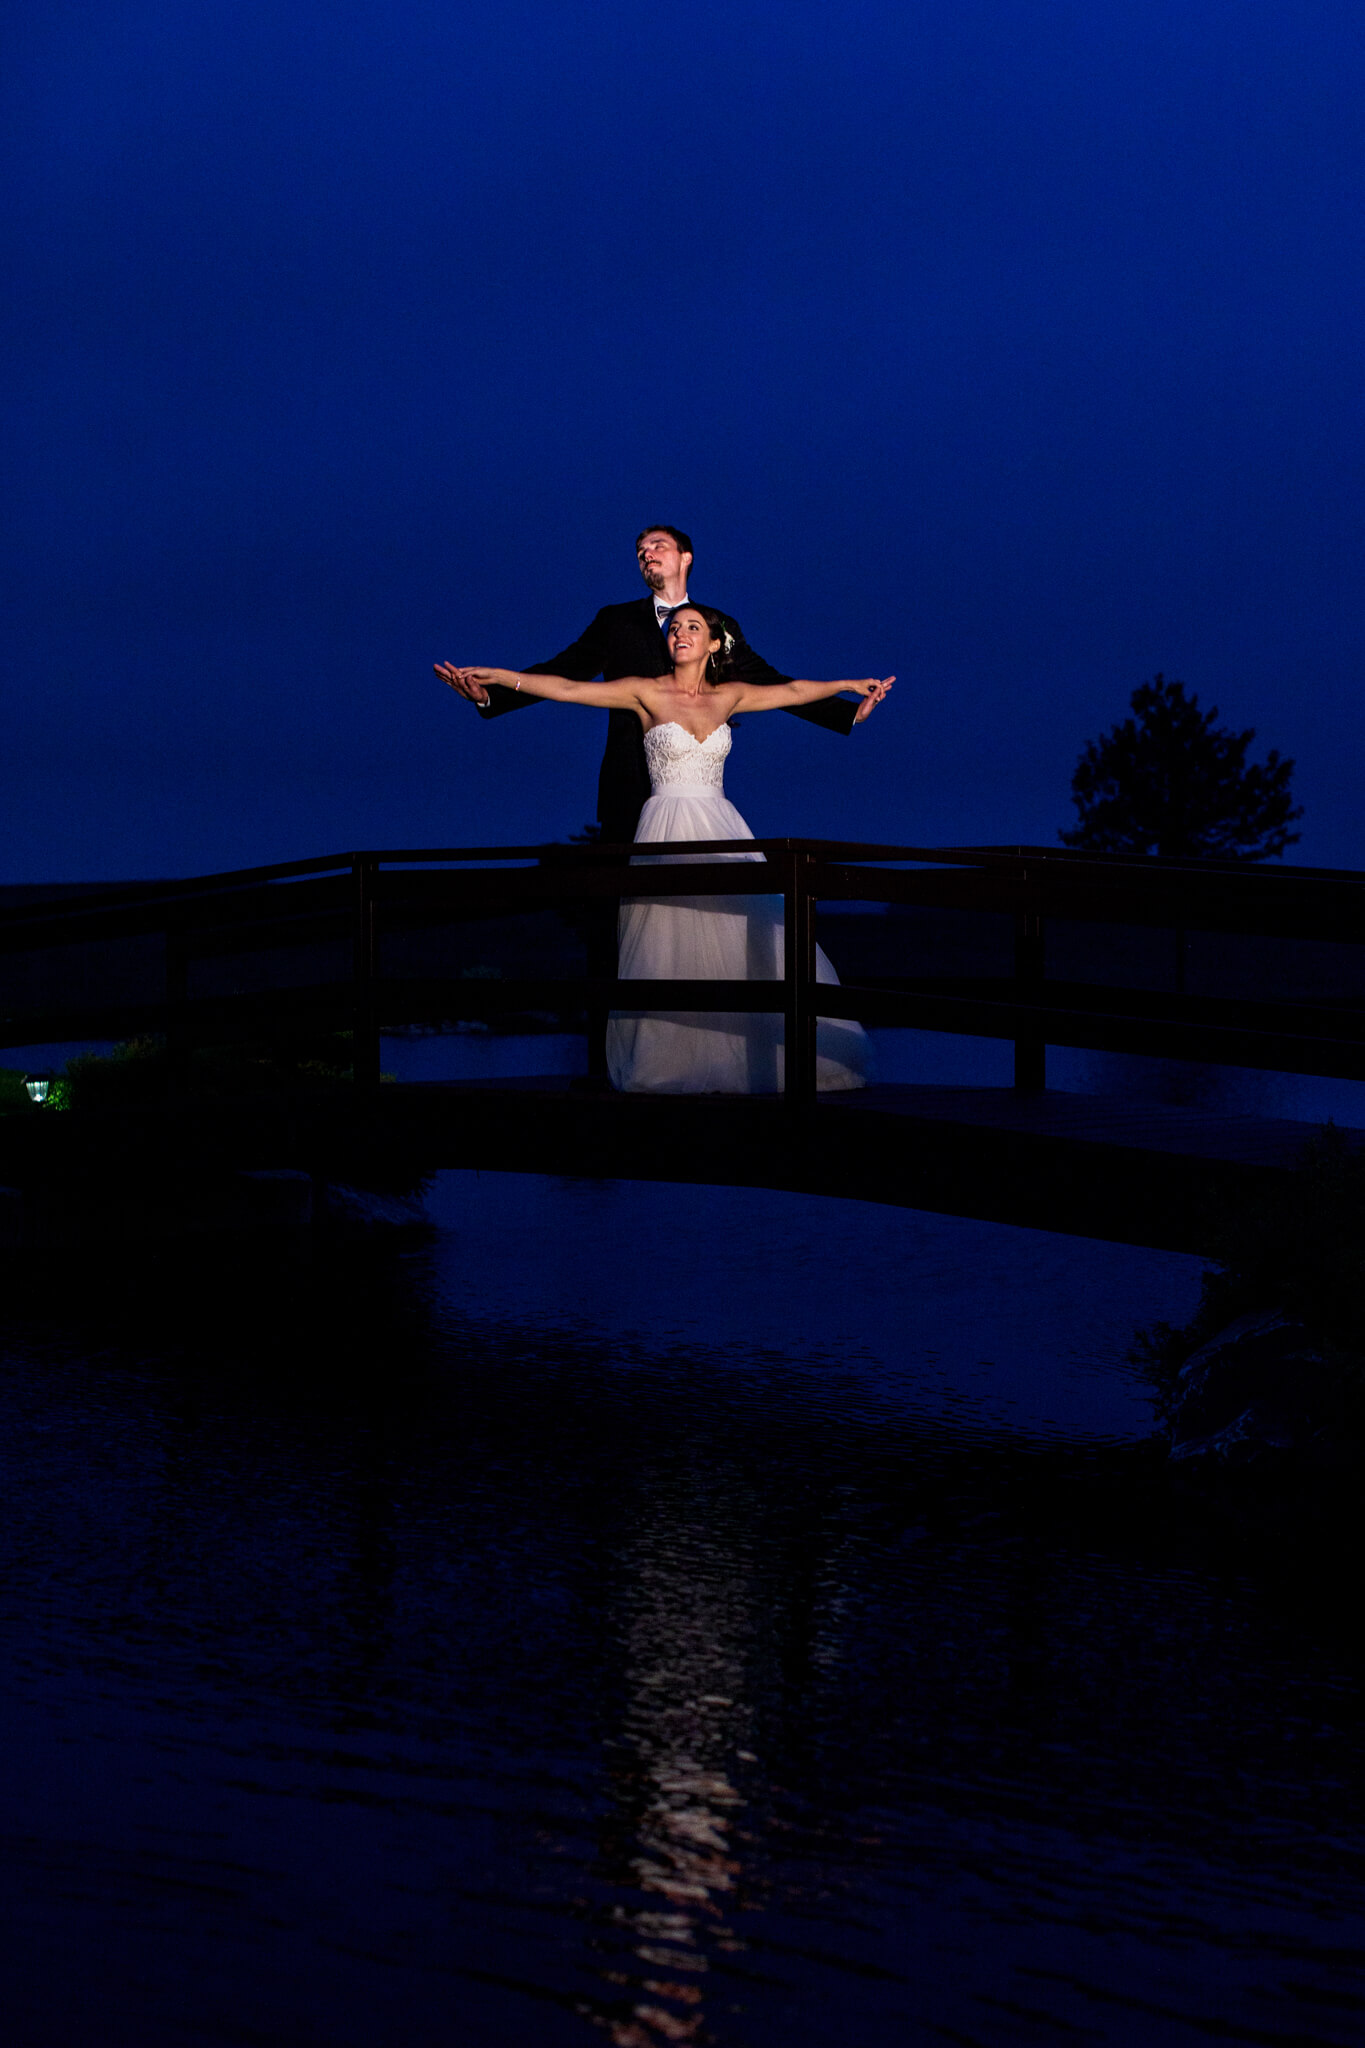 Alysia Jerad Homestead Blessings Farm Hershey PA Wedding Rustic Chique - 92.JPG